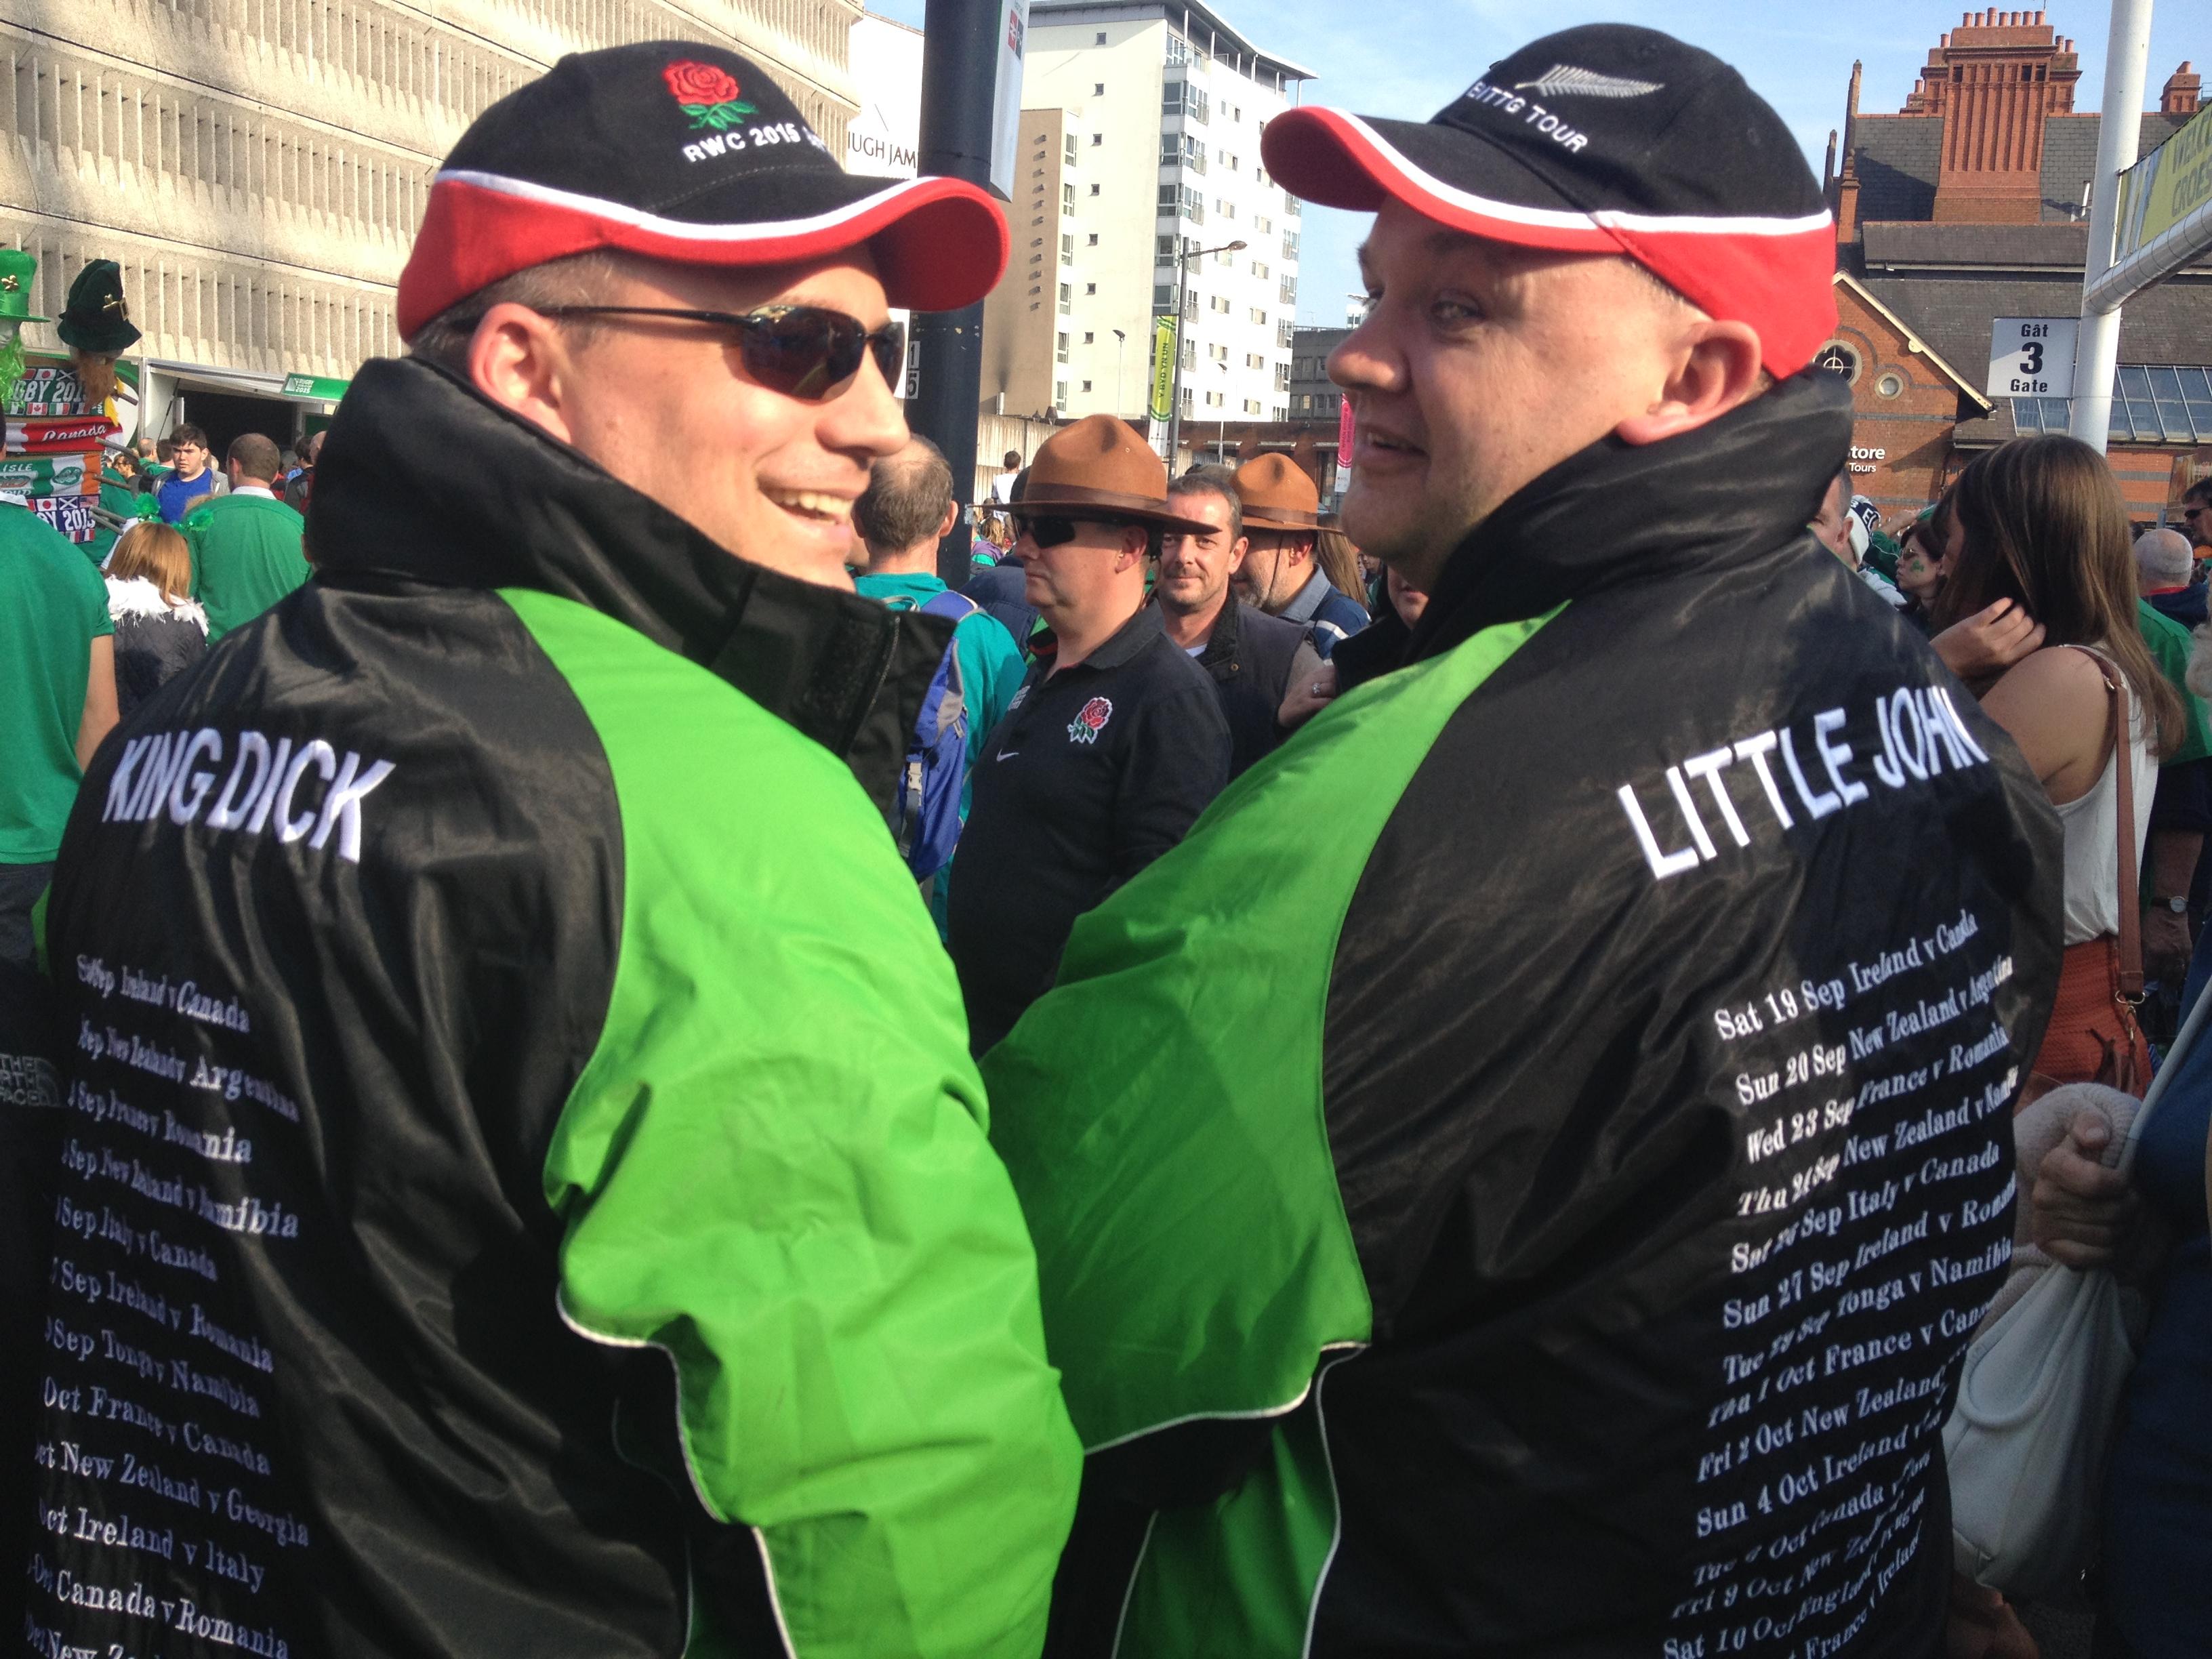 King Dick and Little John (two guys wearing jackets , one is King Dick and the other, is Little John RWC2015